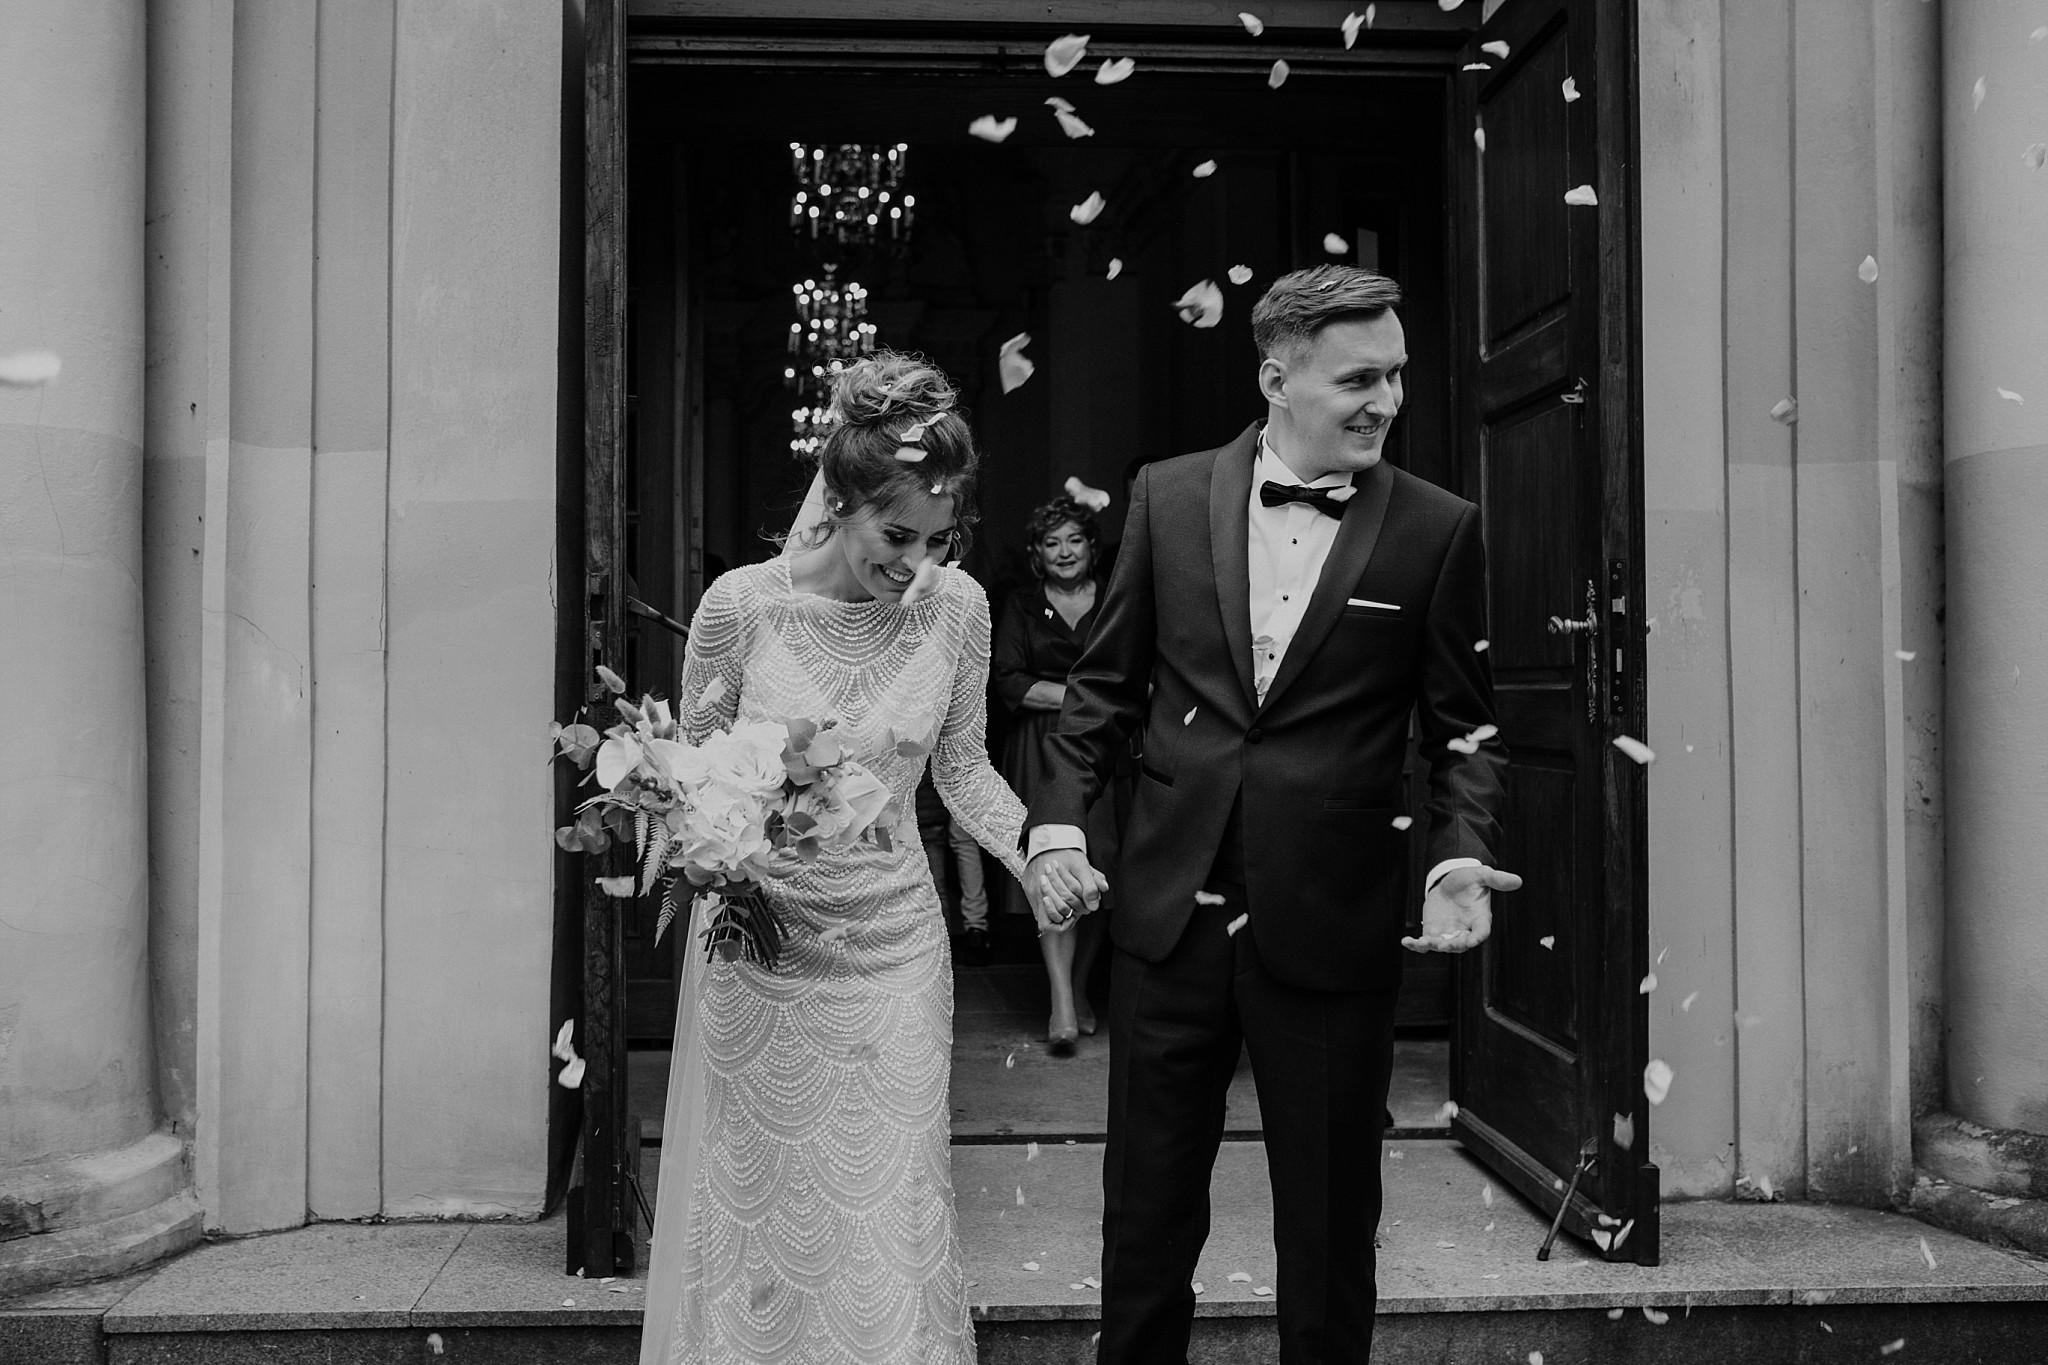 fotograf poznan wesele dobra truskawka piekne wesele pod poznaniem wesele w dobrej truskawce piekna para mloda slub marzen slub koronawirus slub listopad wesele koronawirus 221